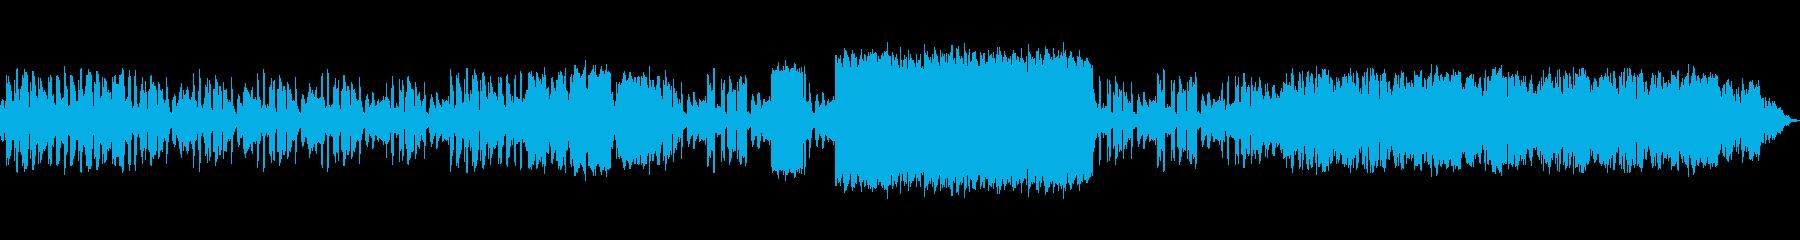 SF・宇宙的を連想させるBGMの再生済みの波形